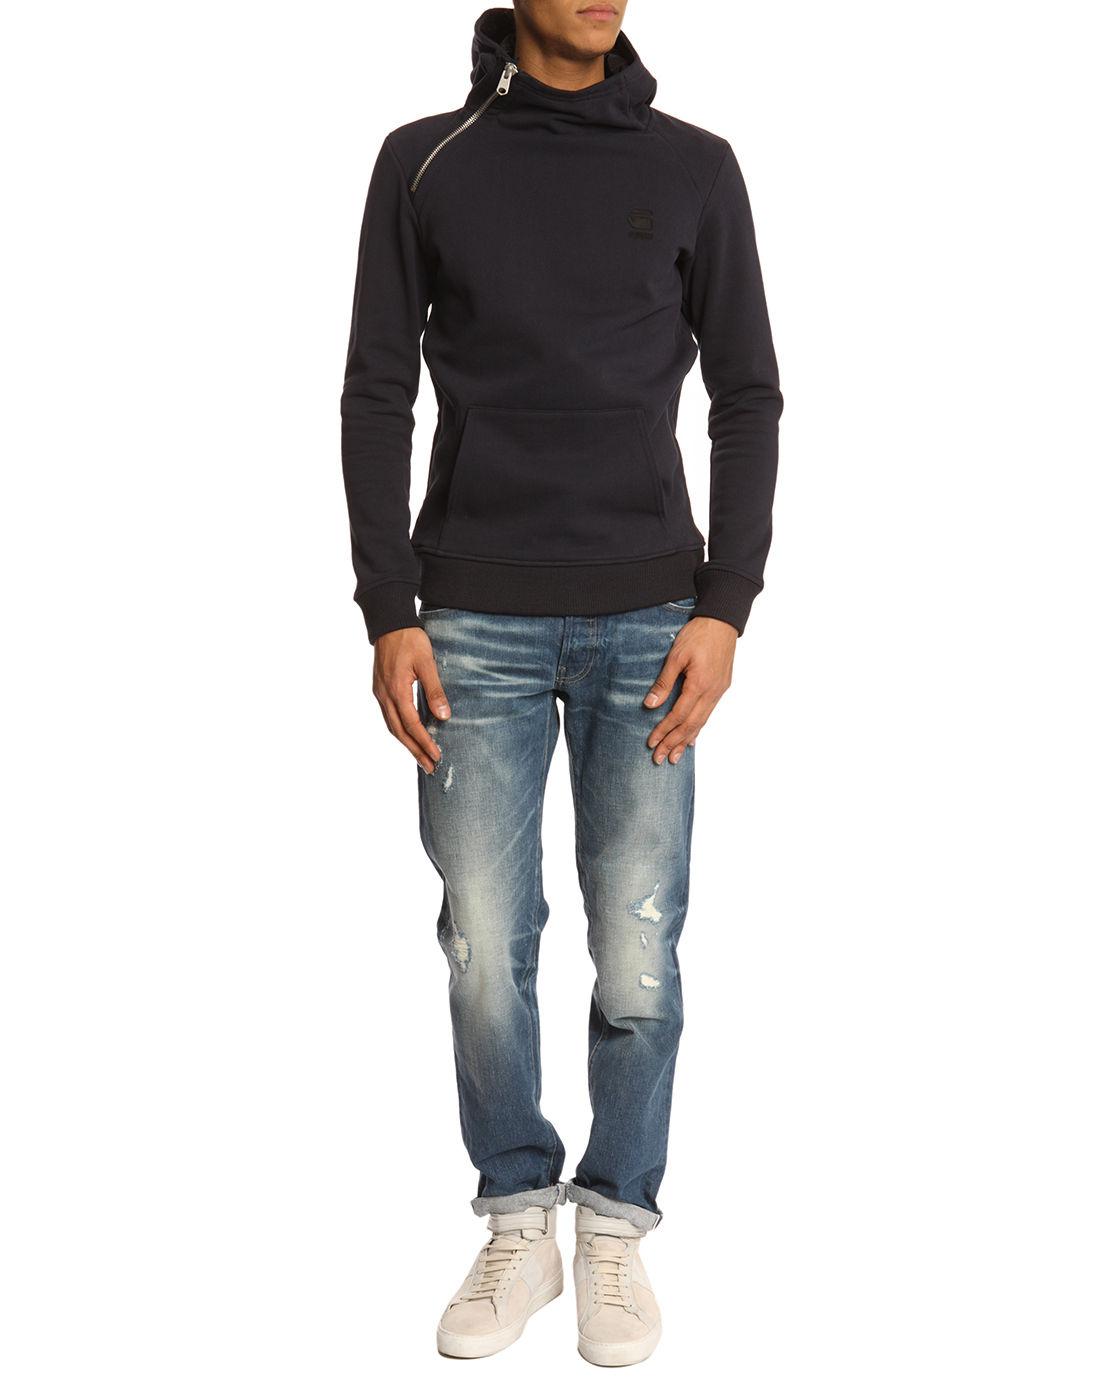 g star raw canadian navy hooded sweatshirt in blue for men. Black Bedroom Furniture Sets. Home Design Ideas